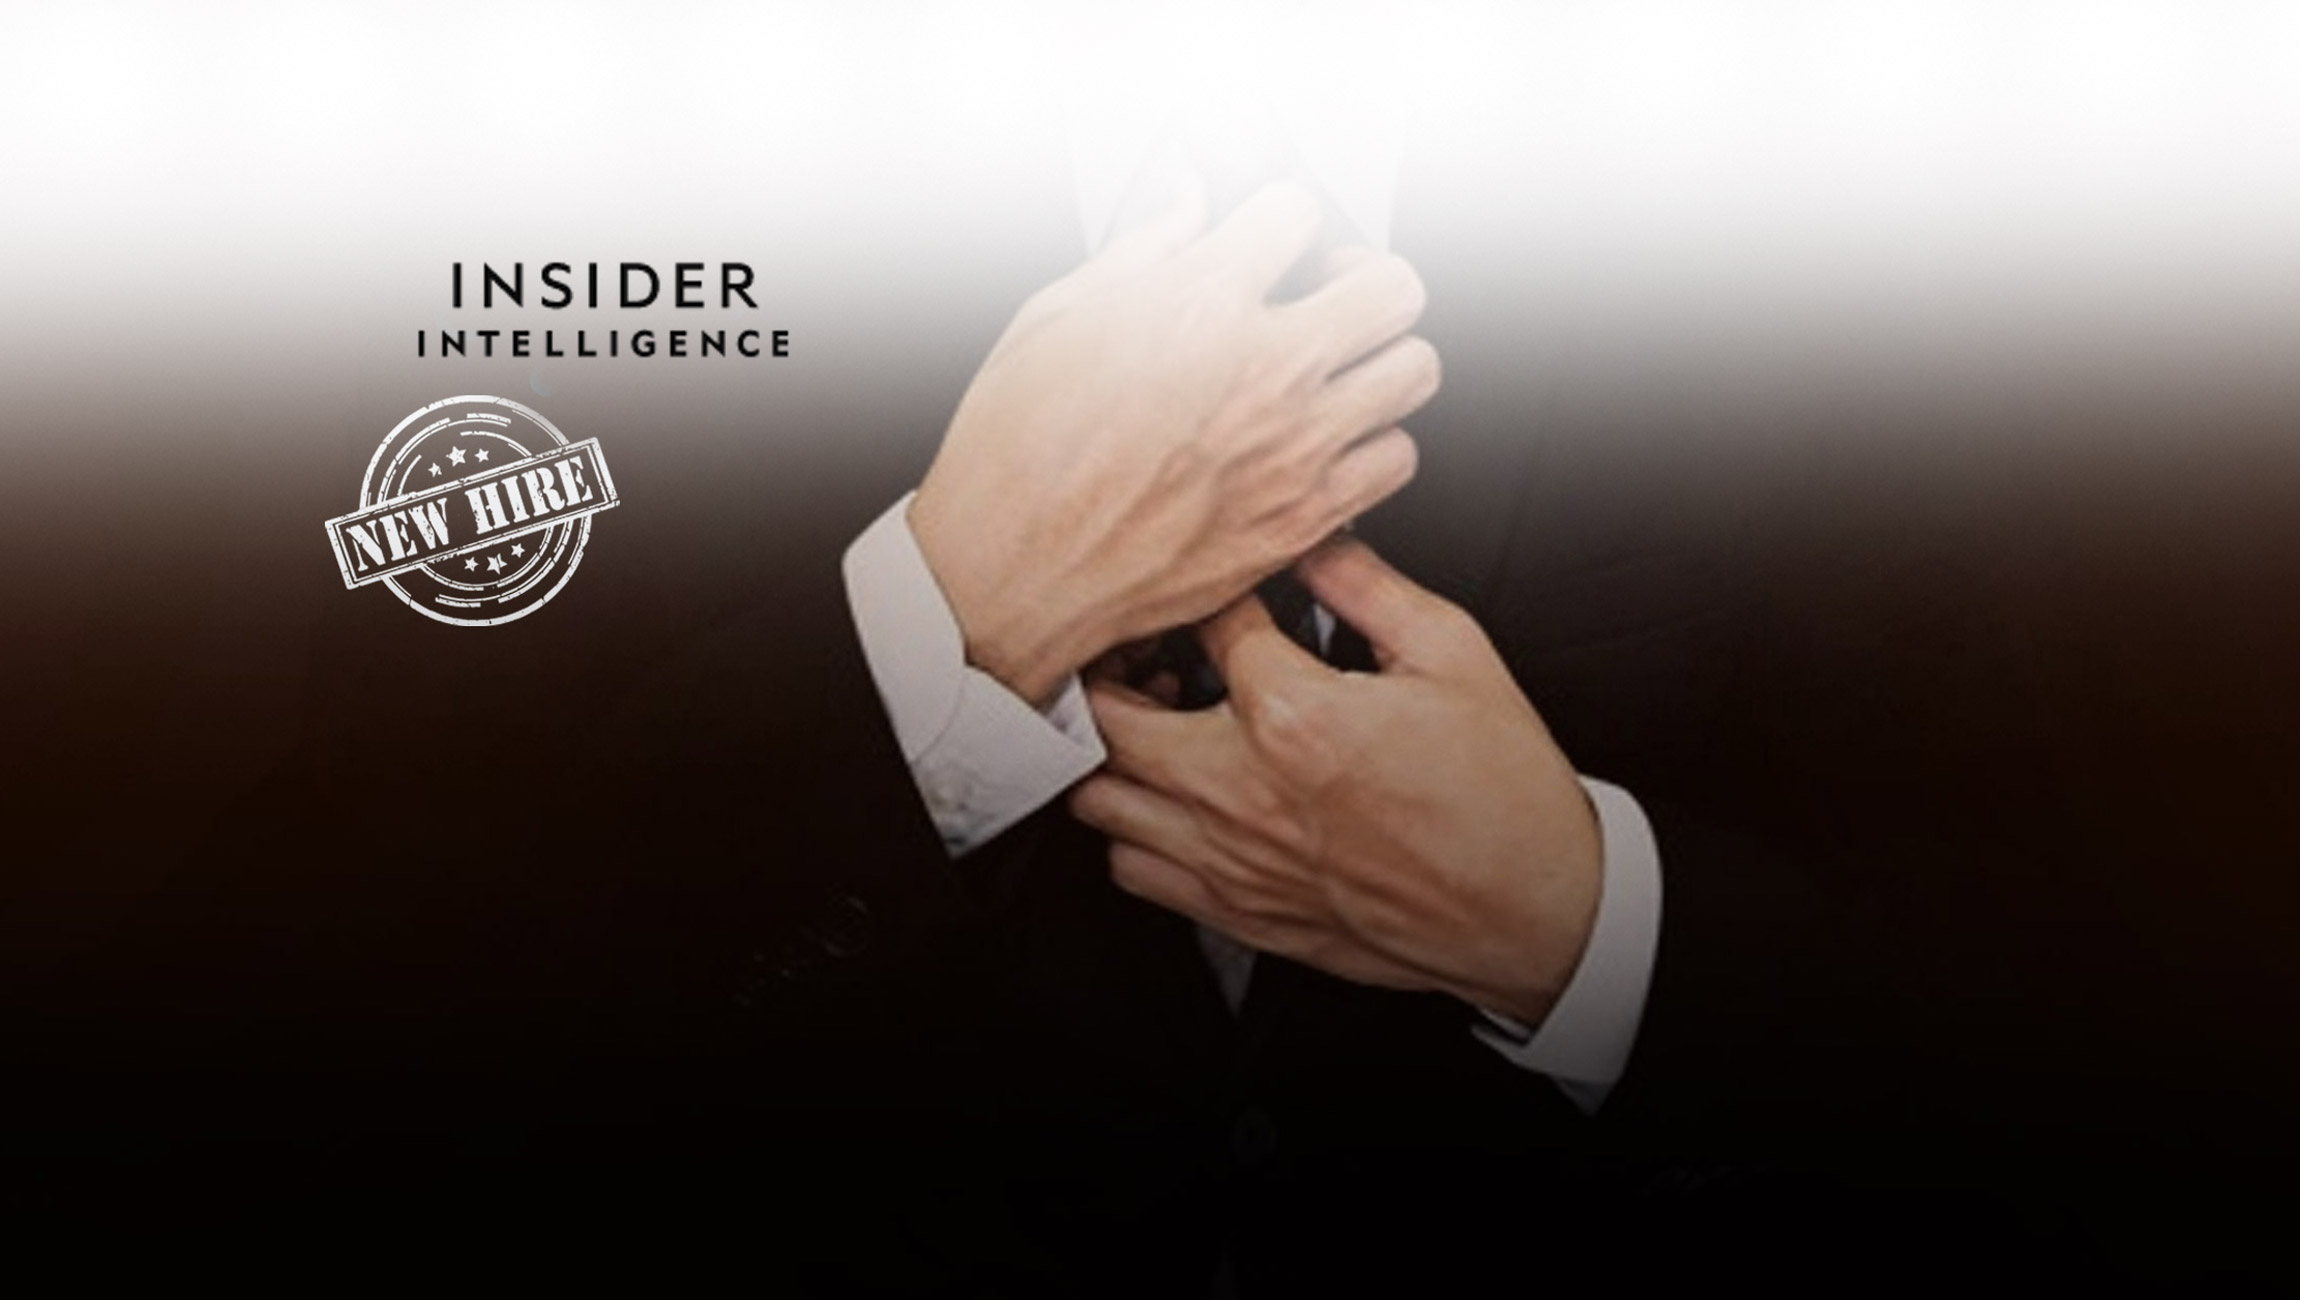 Insider Intelligence Names Steve Dodman SVP of Sales